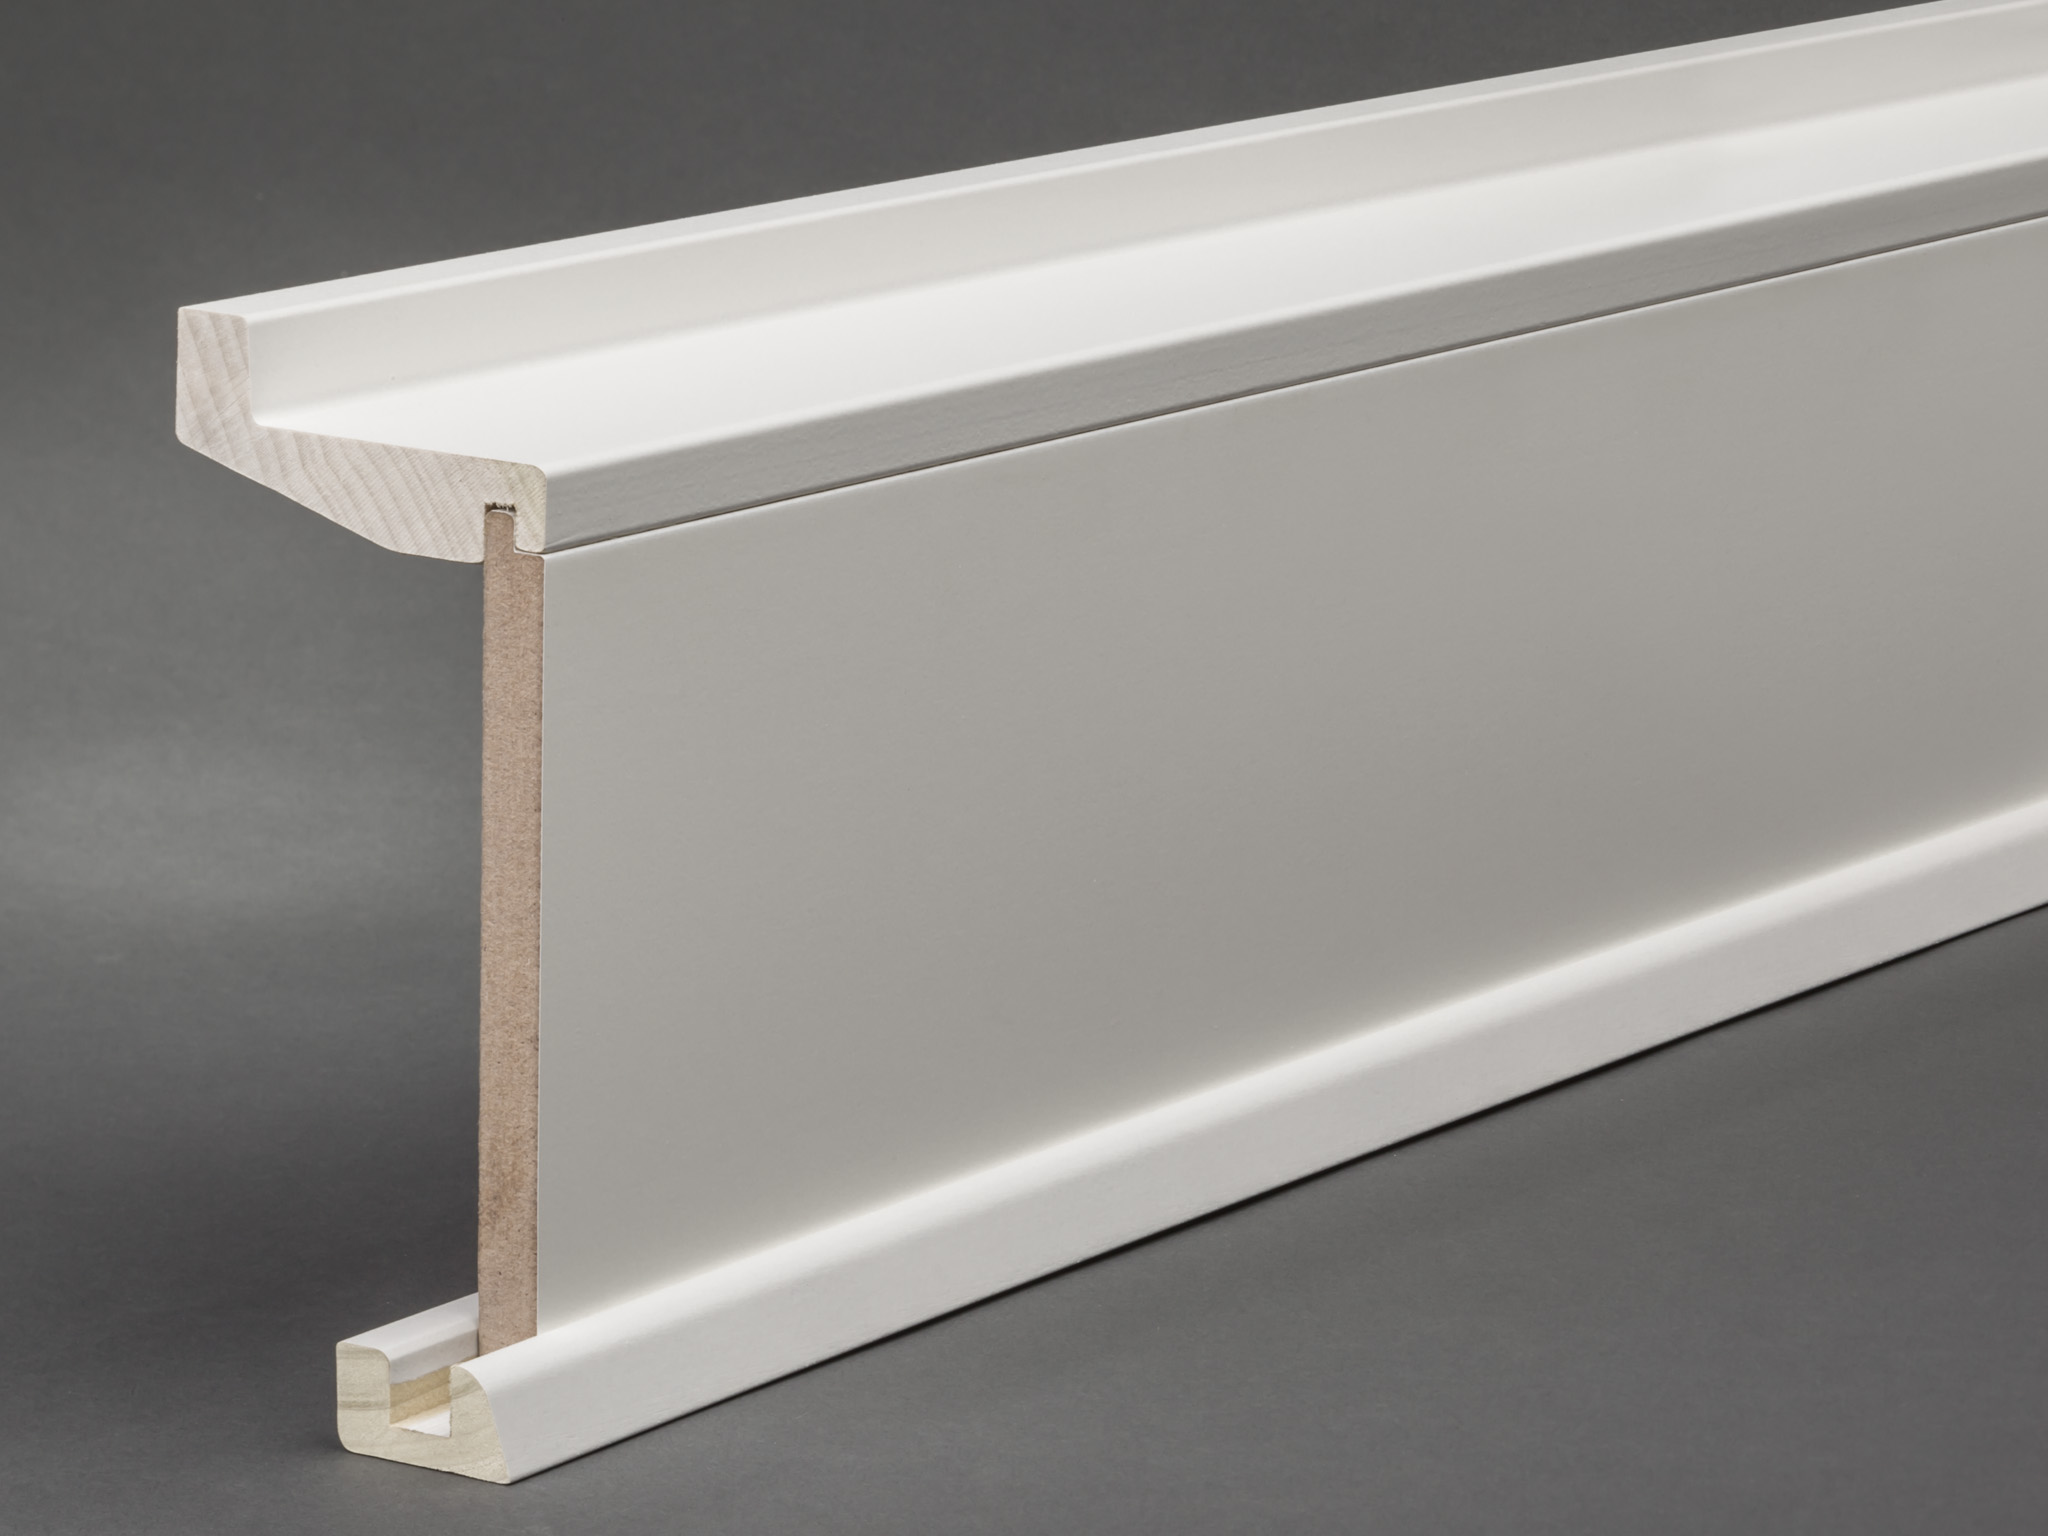 massivholz mdf wei lackiert 147x69 mm rohrabdeckleiste oberkante profiliert fu leisten welt. Black Bedroom Furniture Sets. Home Design Ideas